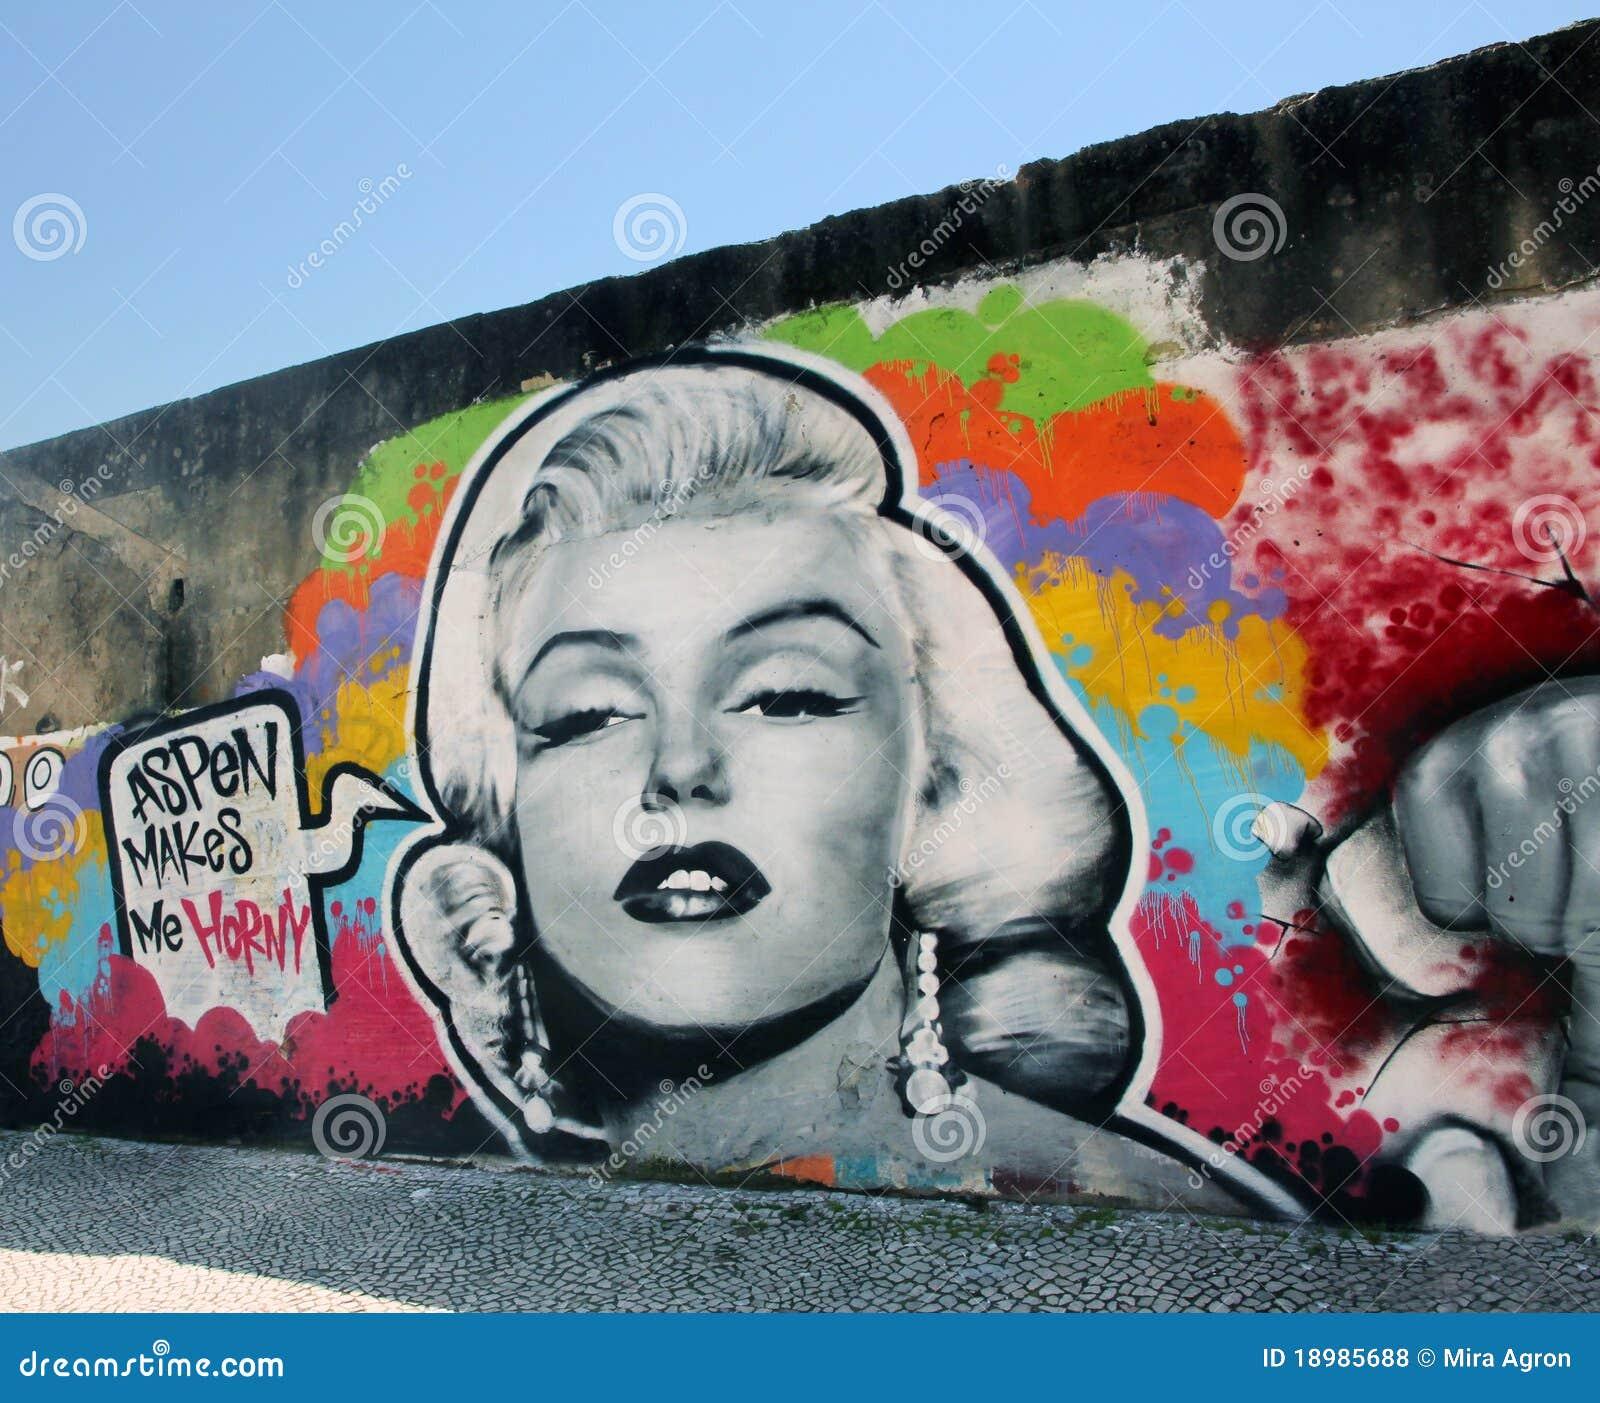 Marilyn Monroe Graffiti Stock Photo 18985688 Megapixl